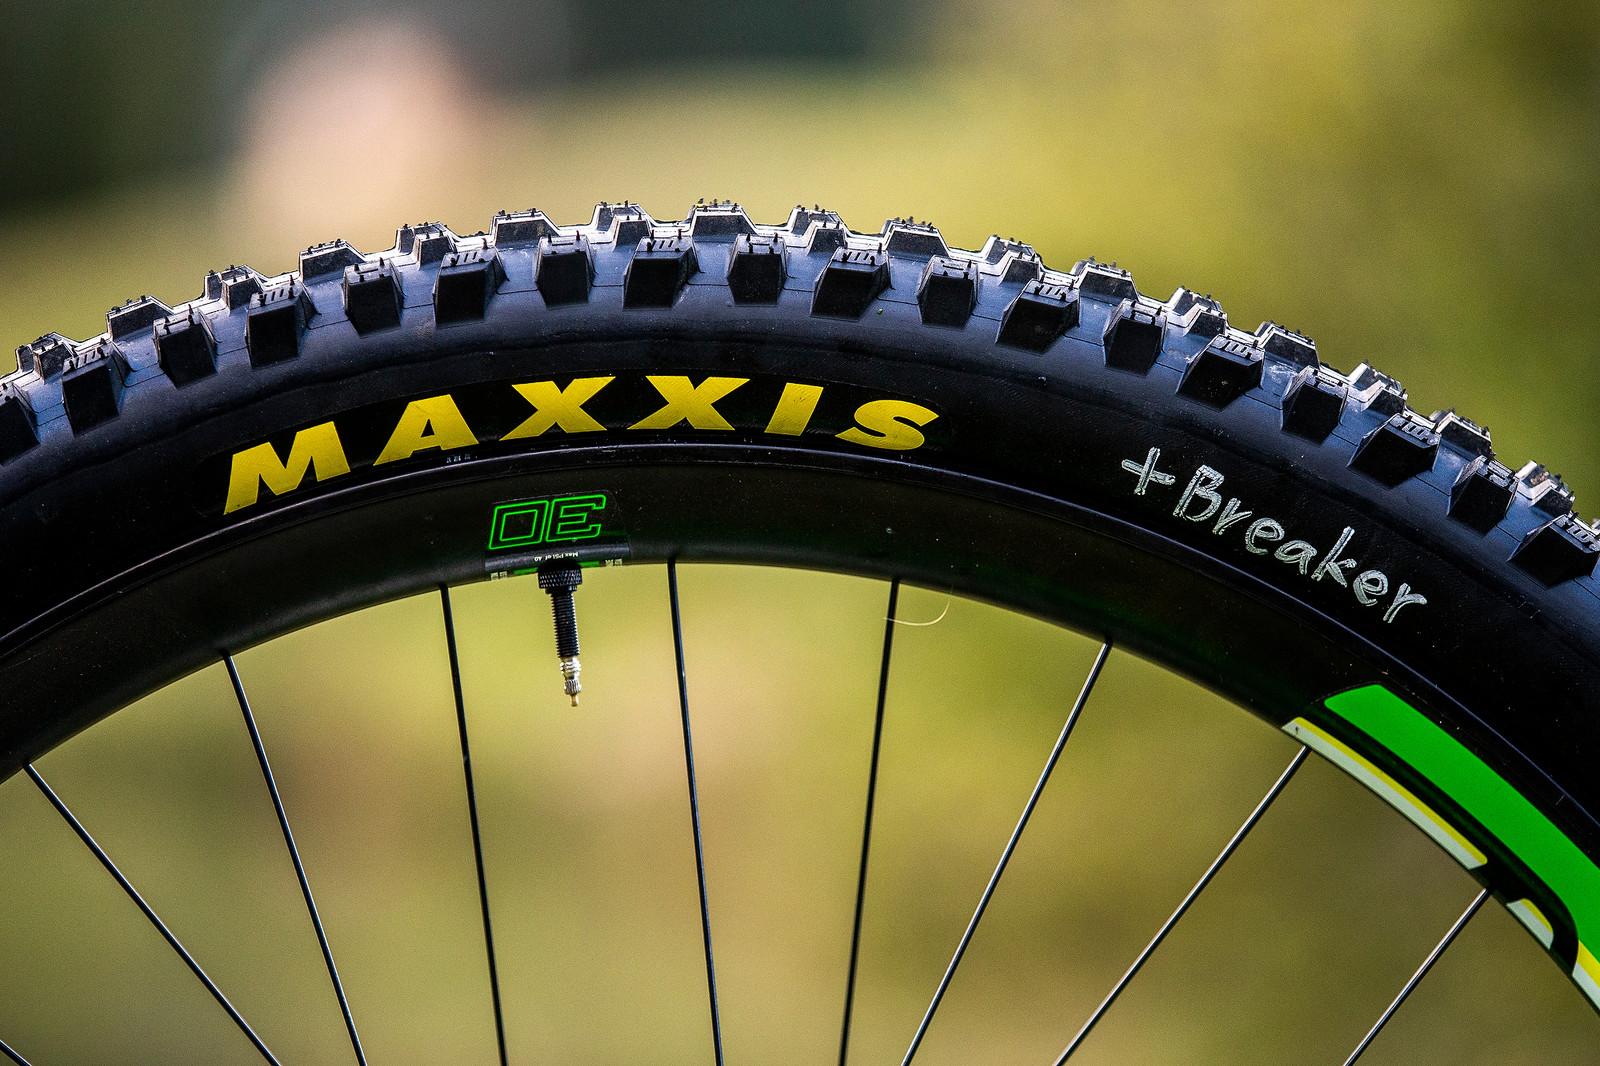 ENVE and Maxxis - WORLD CHAMPS BIKE - Dean Lucas' Intense M29 - Mountain Biking Pictures - Vital MTB